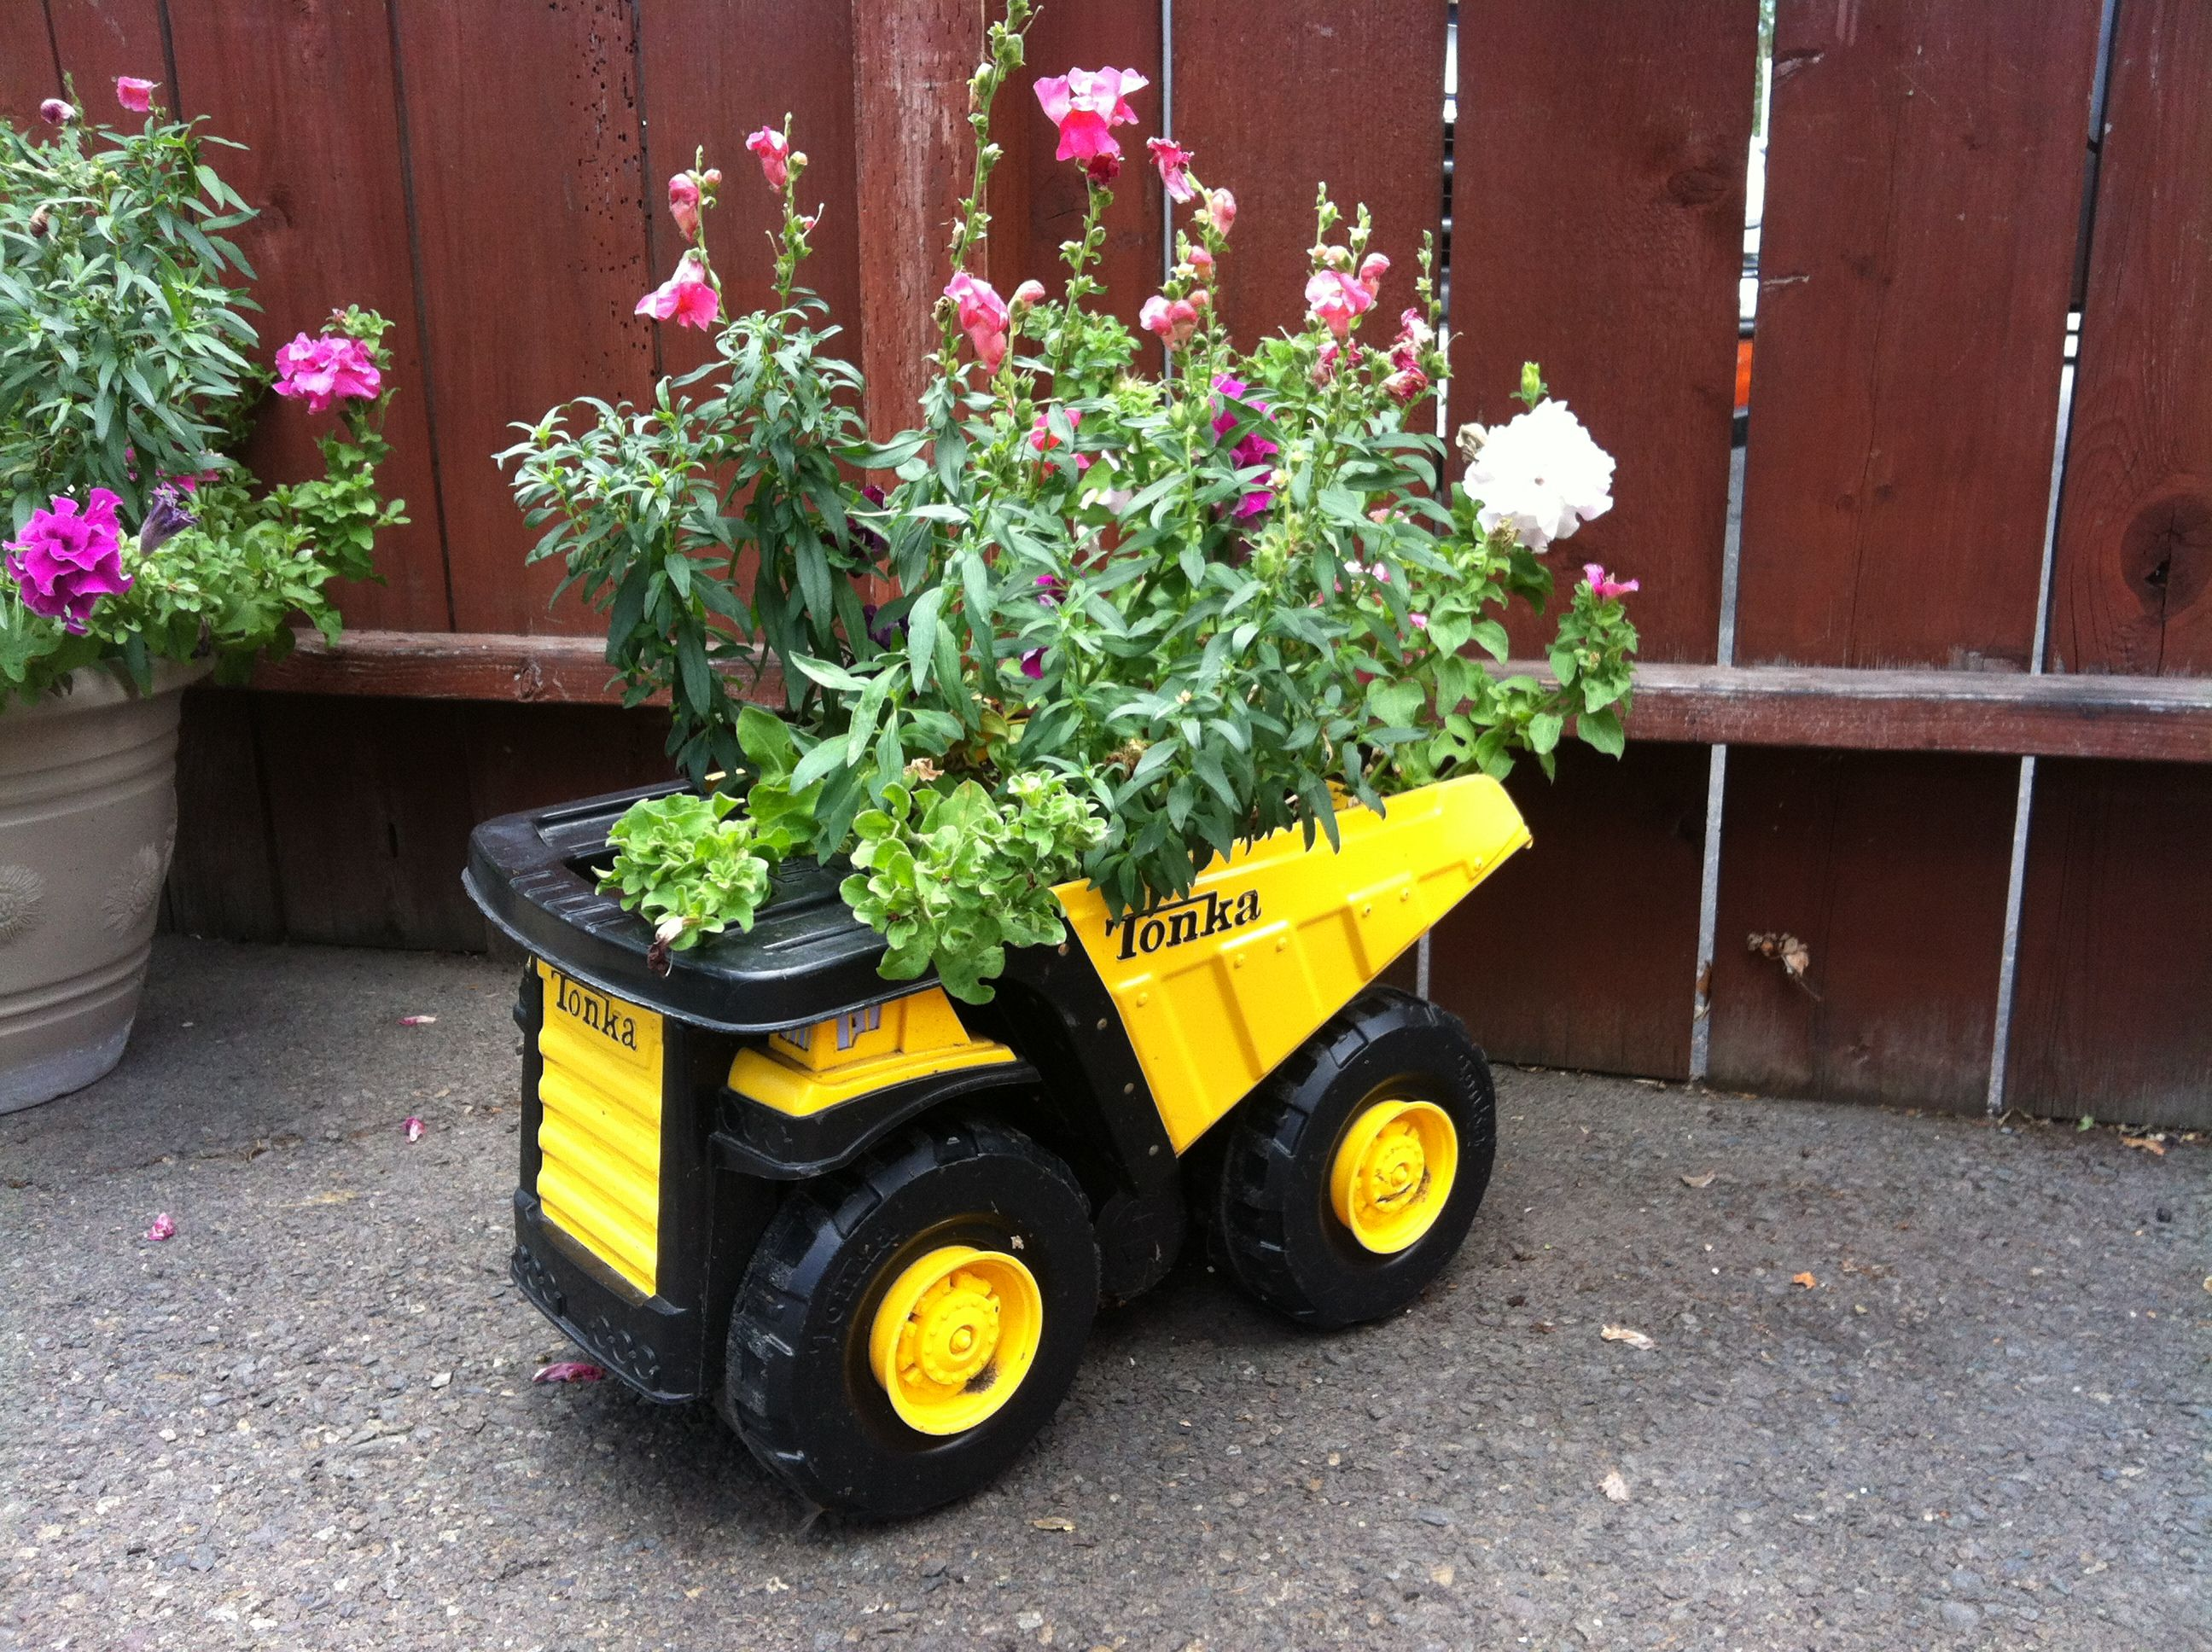 Tonka Truck Planter. Tonka TrucksGarden OrnamentsPlanters